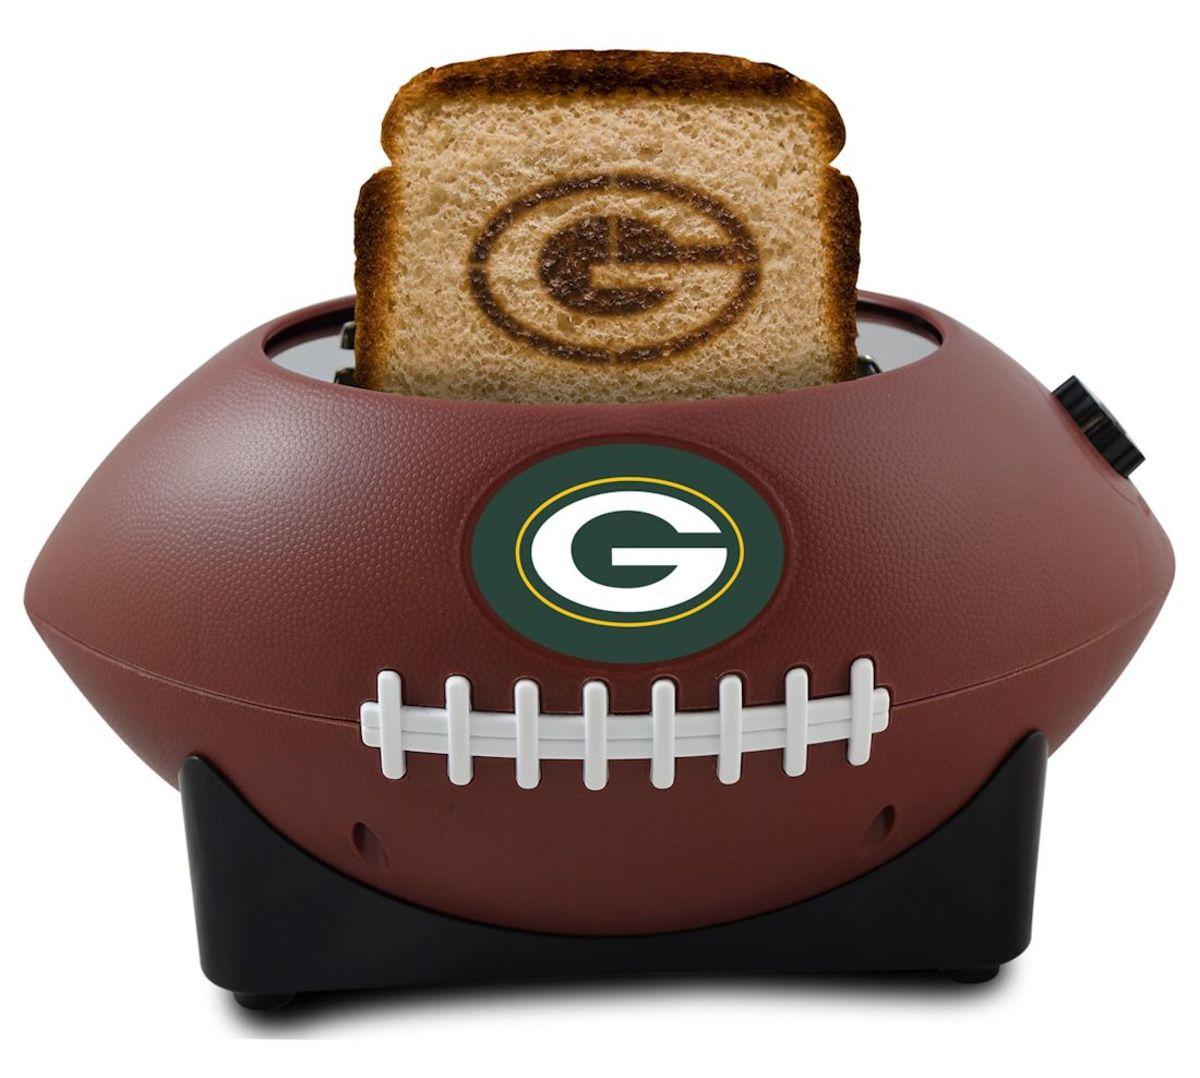 Green Bay Packer Football Toaster